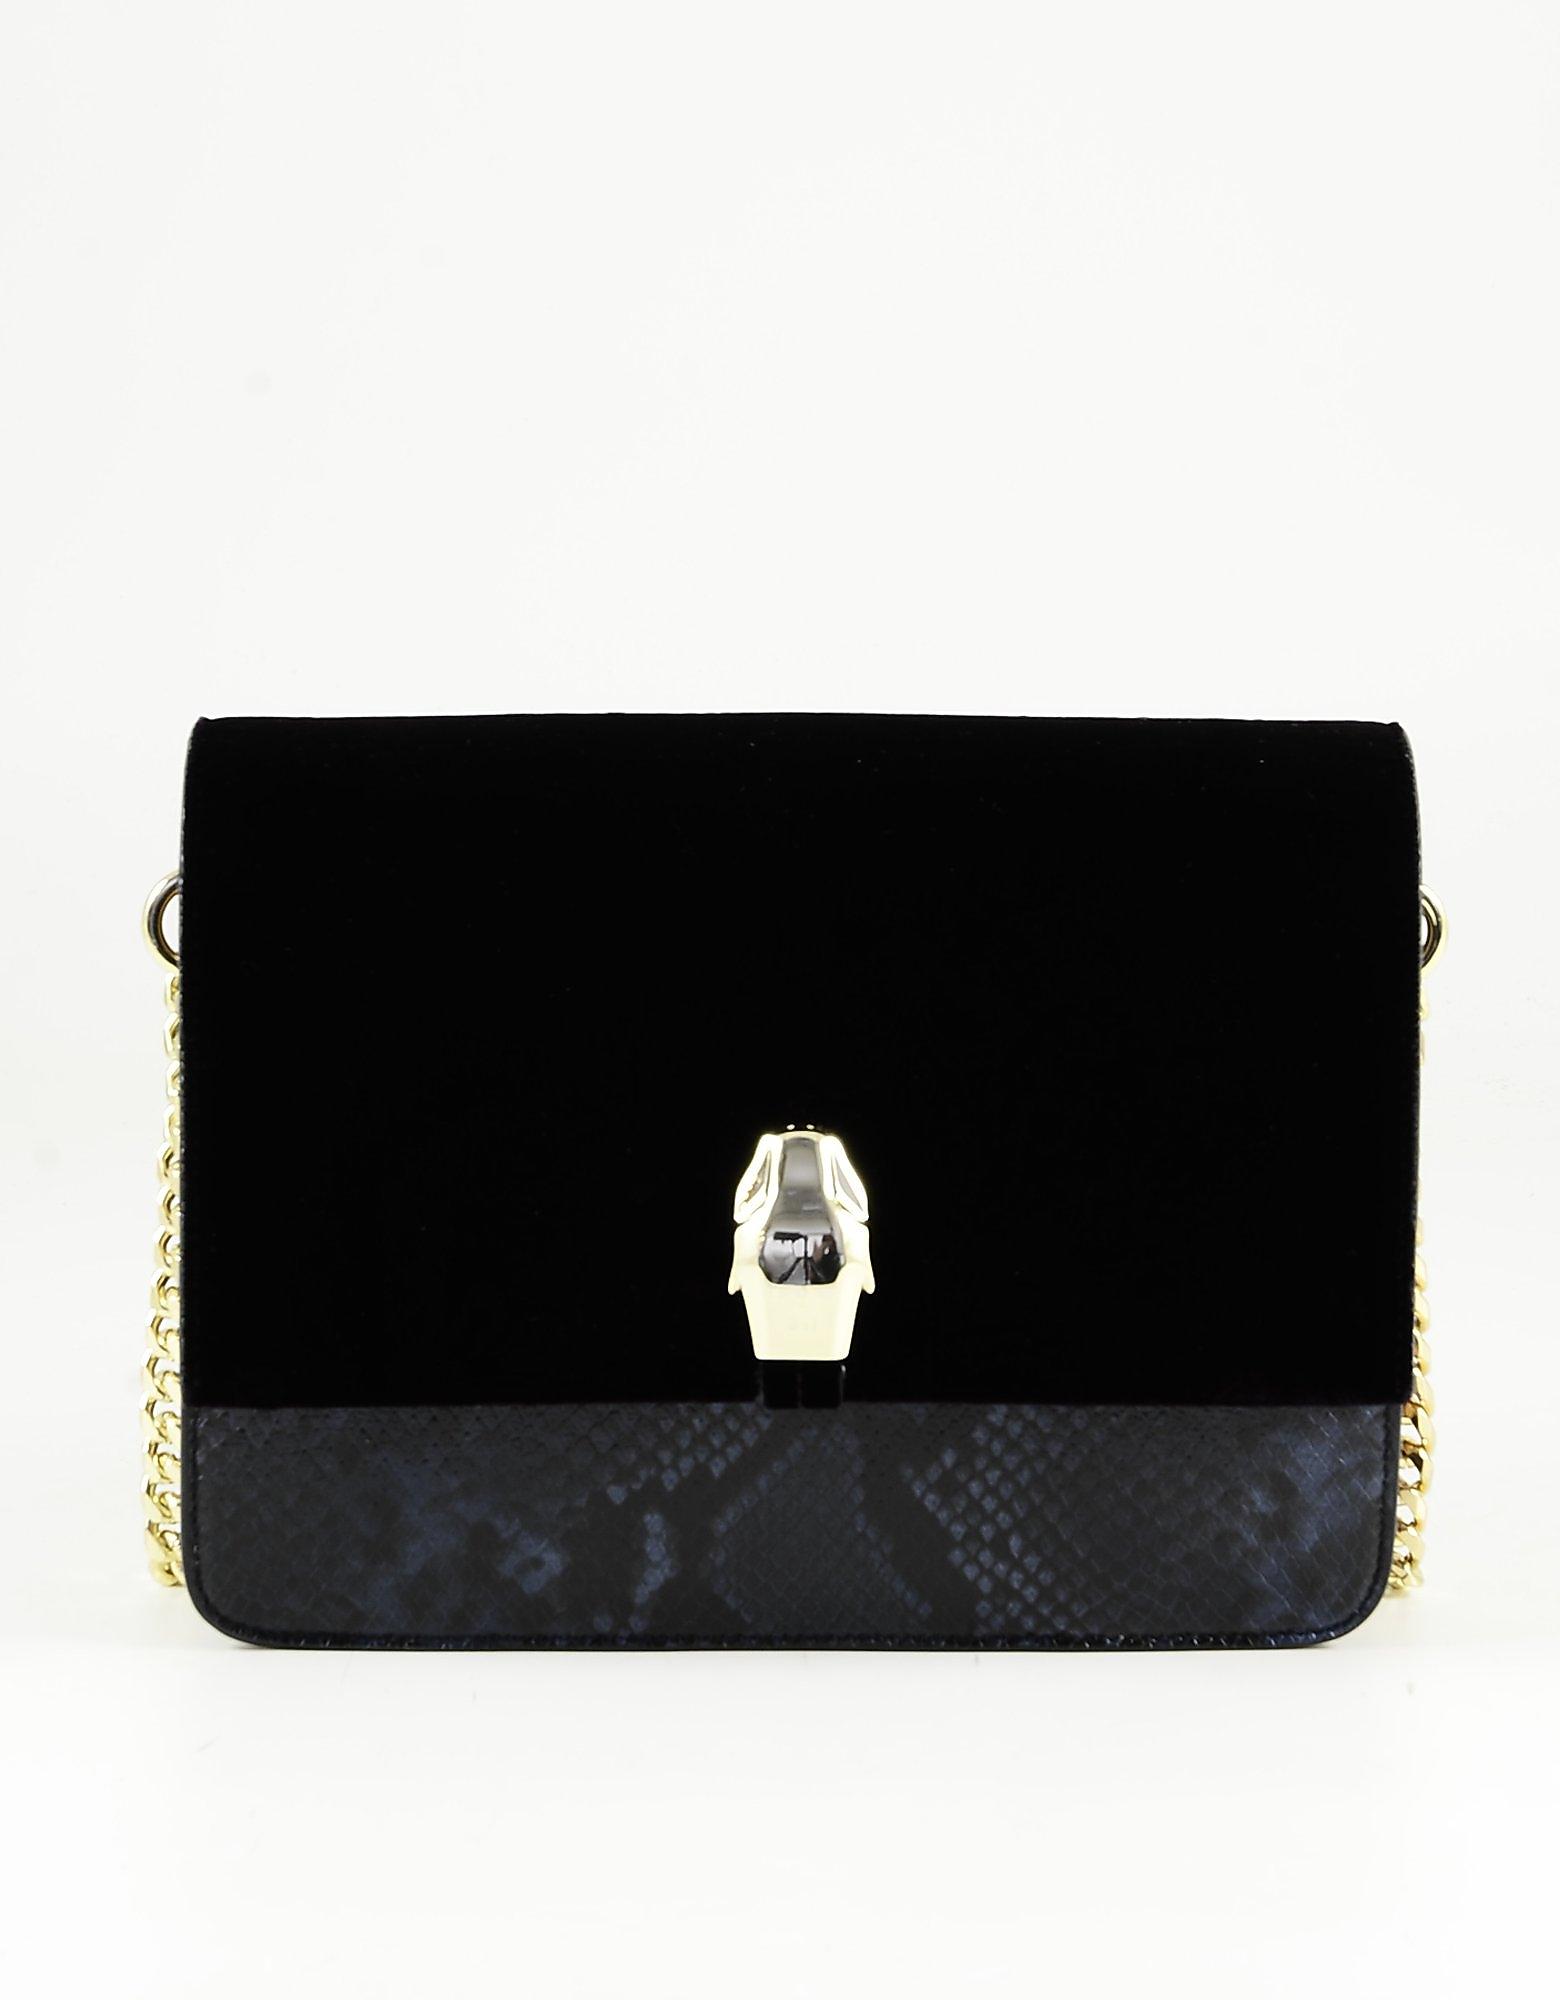 Class Roberto Cavalli Black/blue Animal Print Leather & Velvet Shoulder Bag